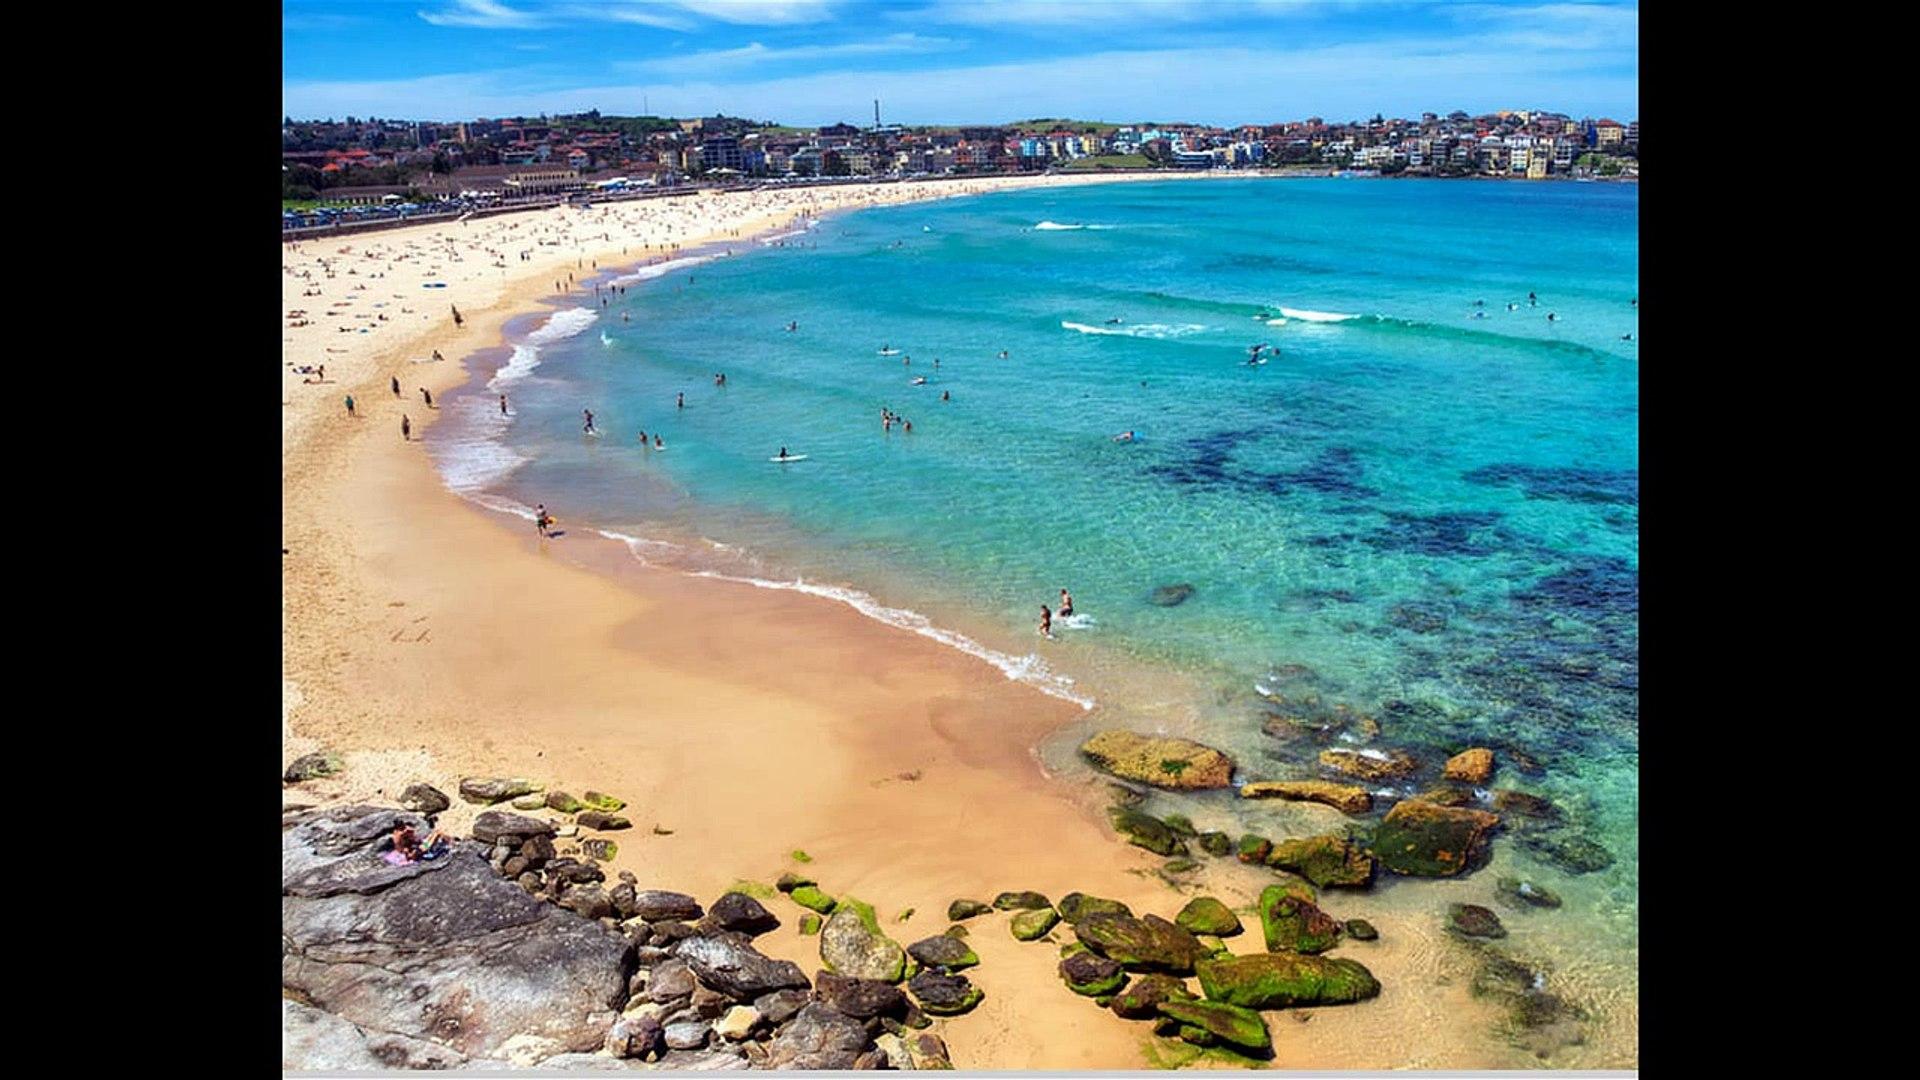 Bondi Beach   bondi beach photos & video   beach rescue    beach australia pictures